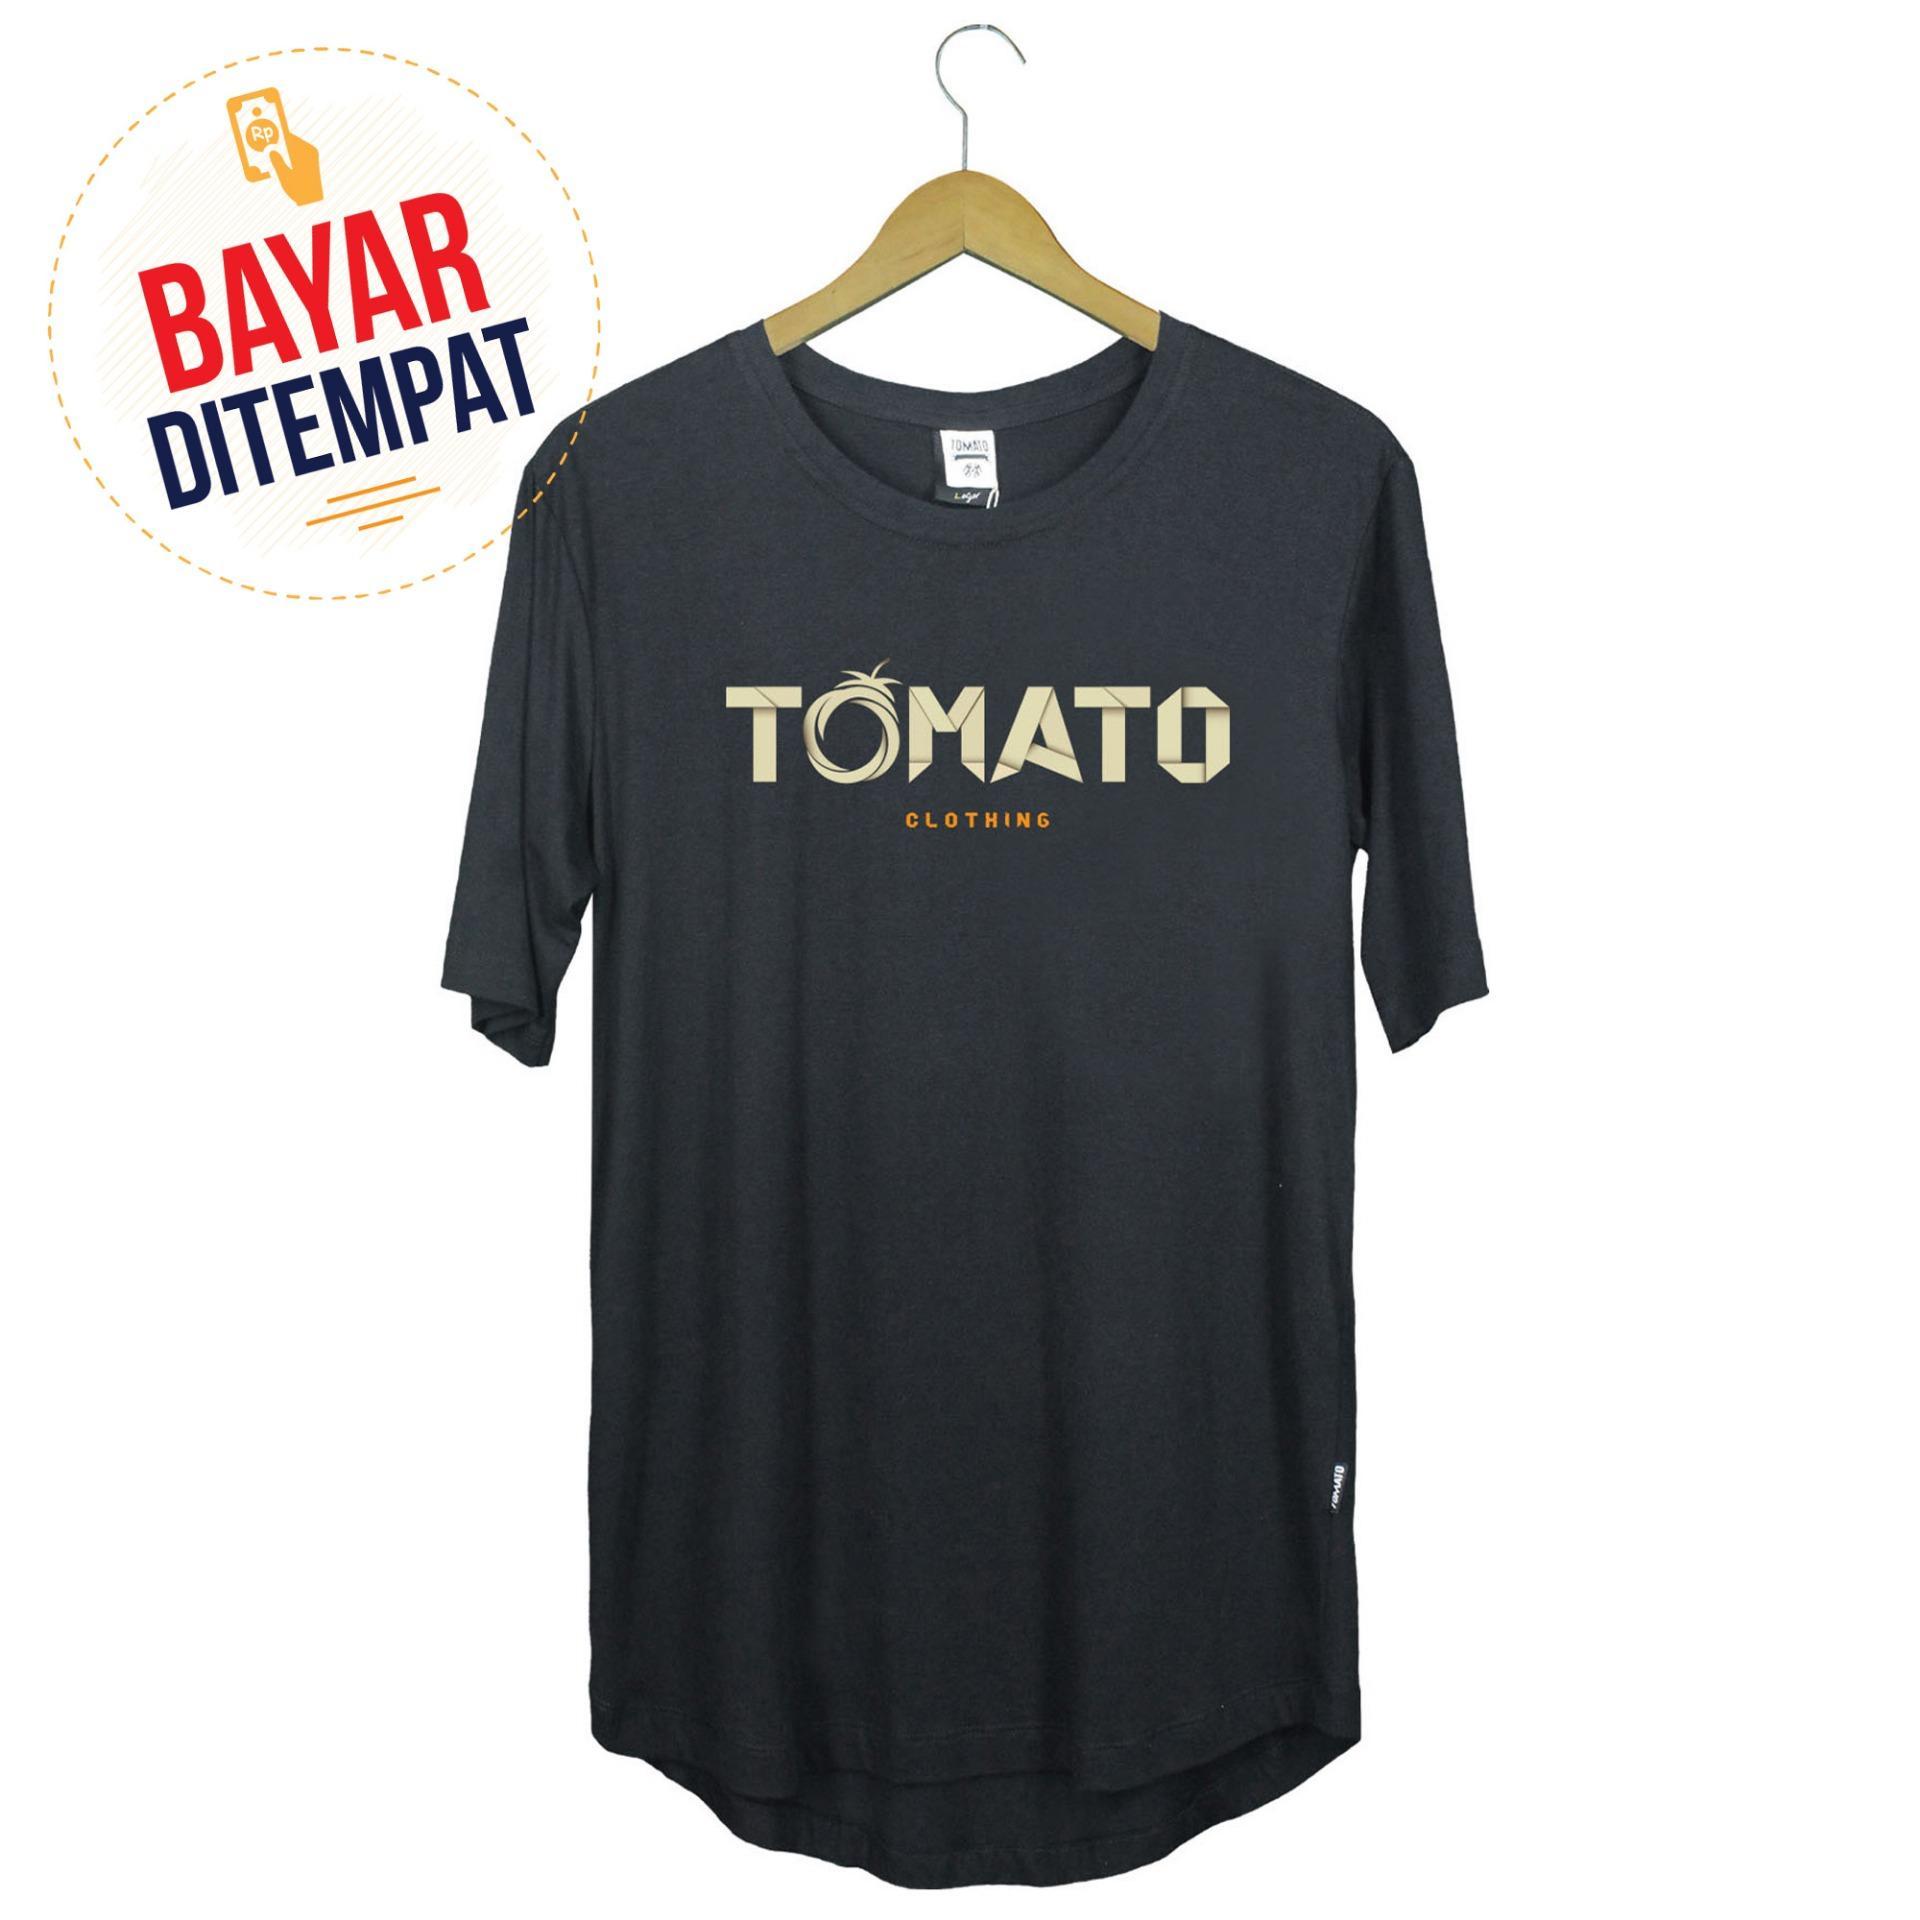 Tomato Clothing Longline Tshirt Kaos Distro Original [Hitam] - Origami